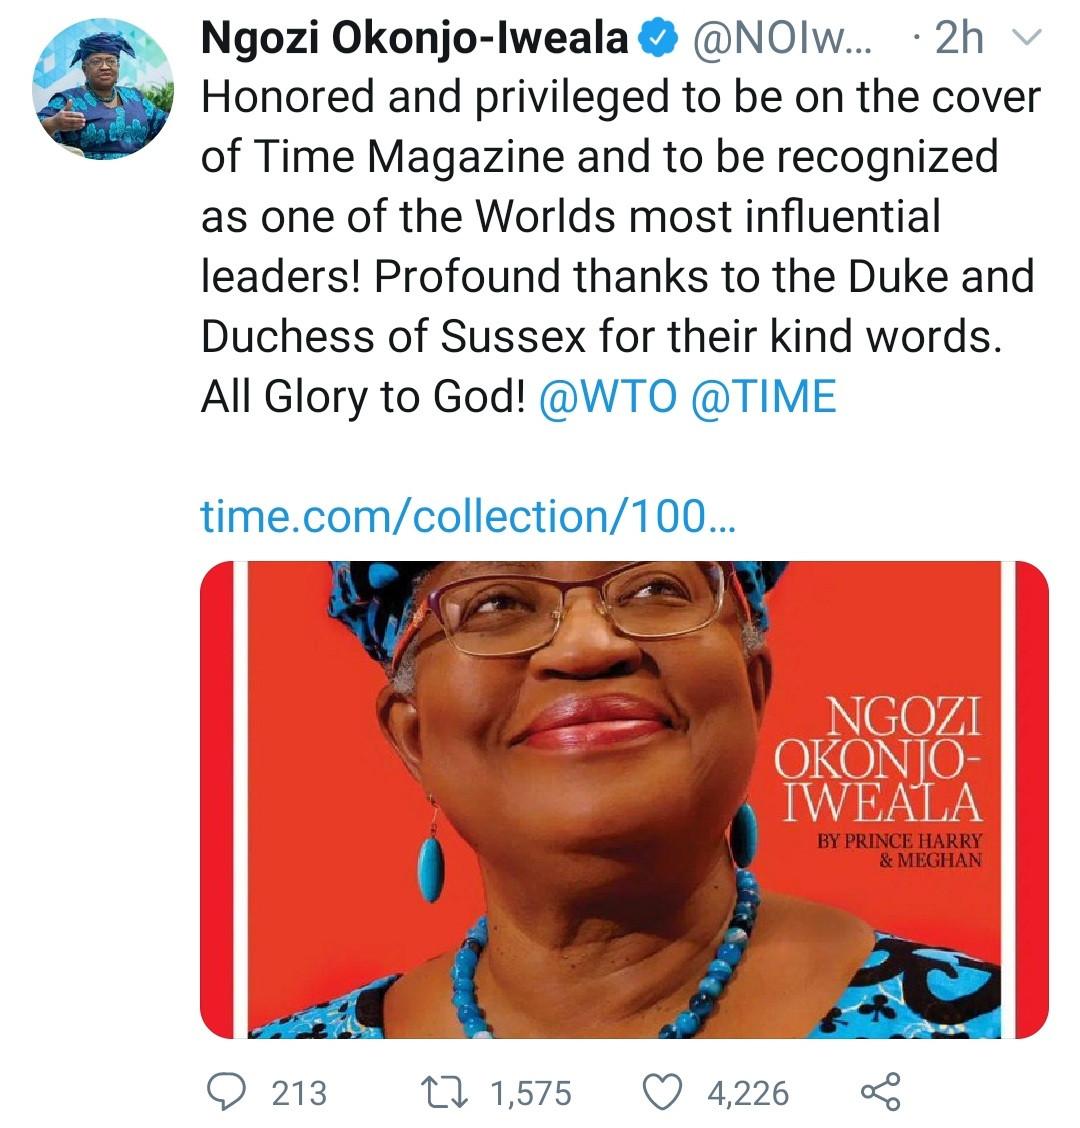 Ngozi Okonjo-Iweala makes Time 100 Most Influential People list